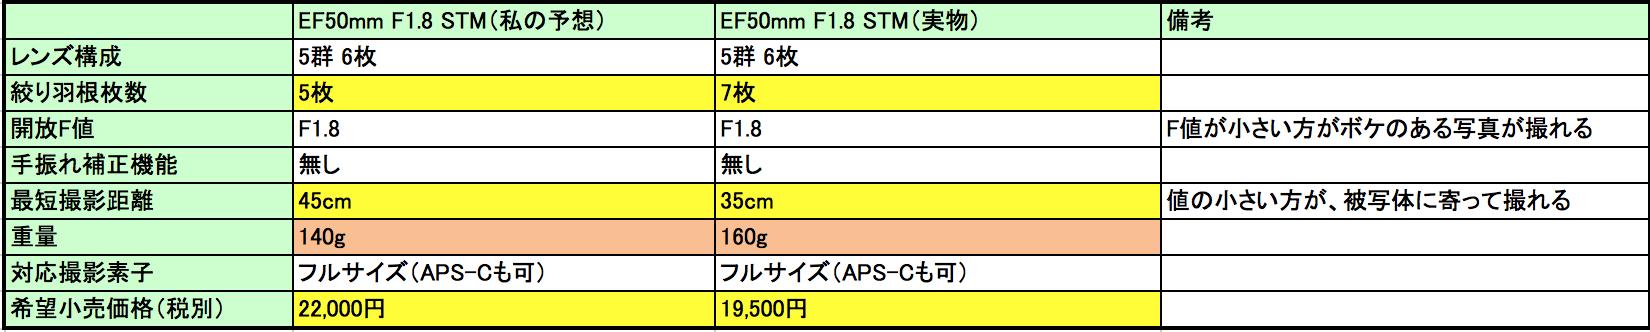 EF50mmF1.8 STMスペック(予想)vs EF50mmF1.8 STMスペック比較表(実物)